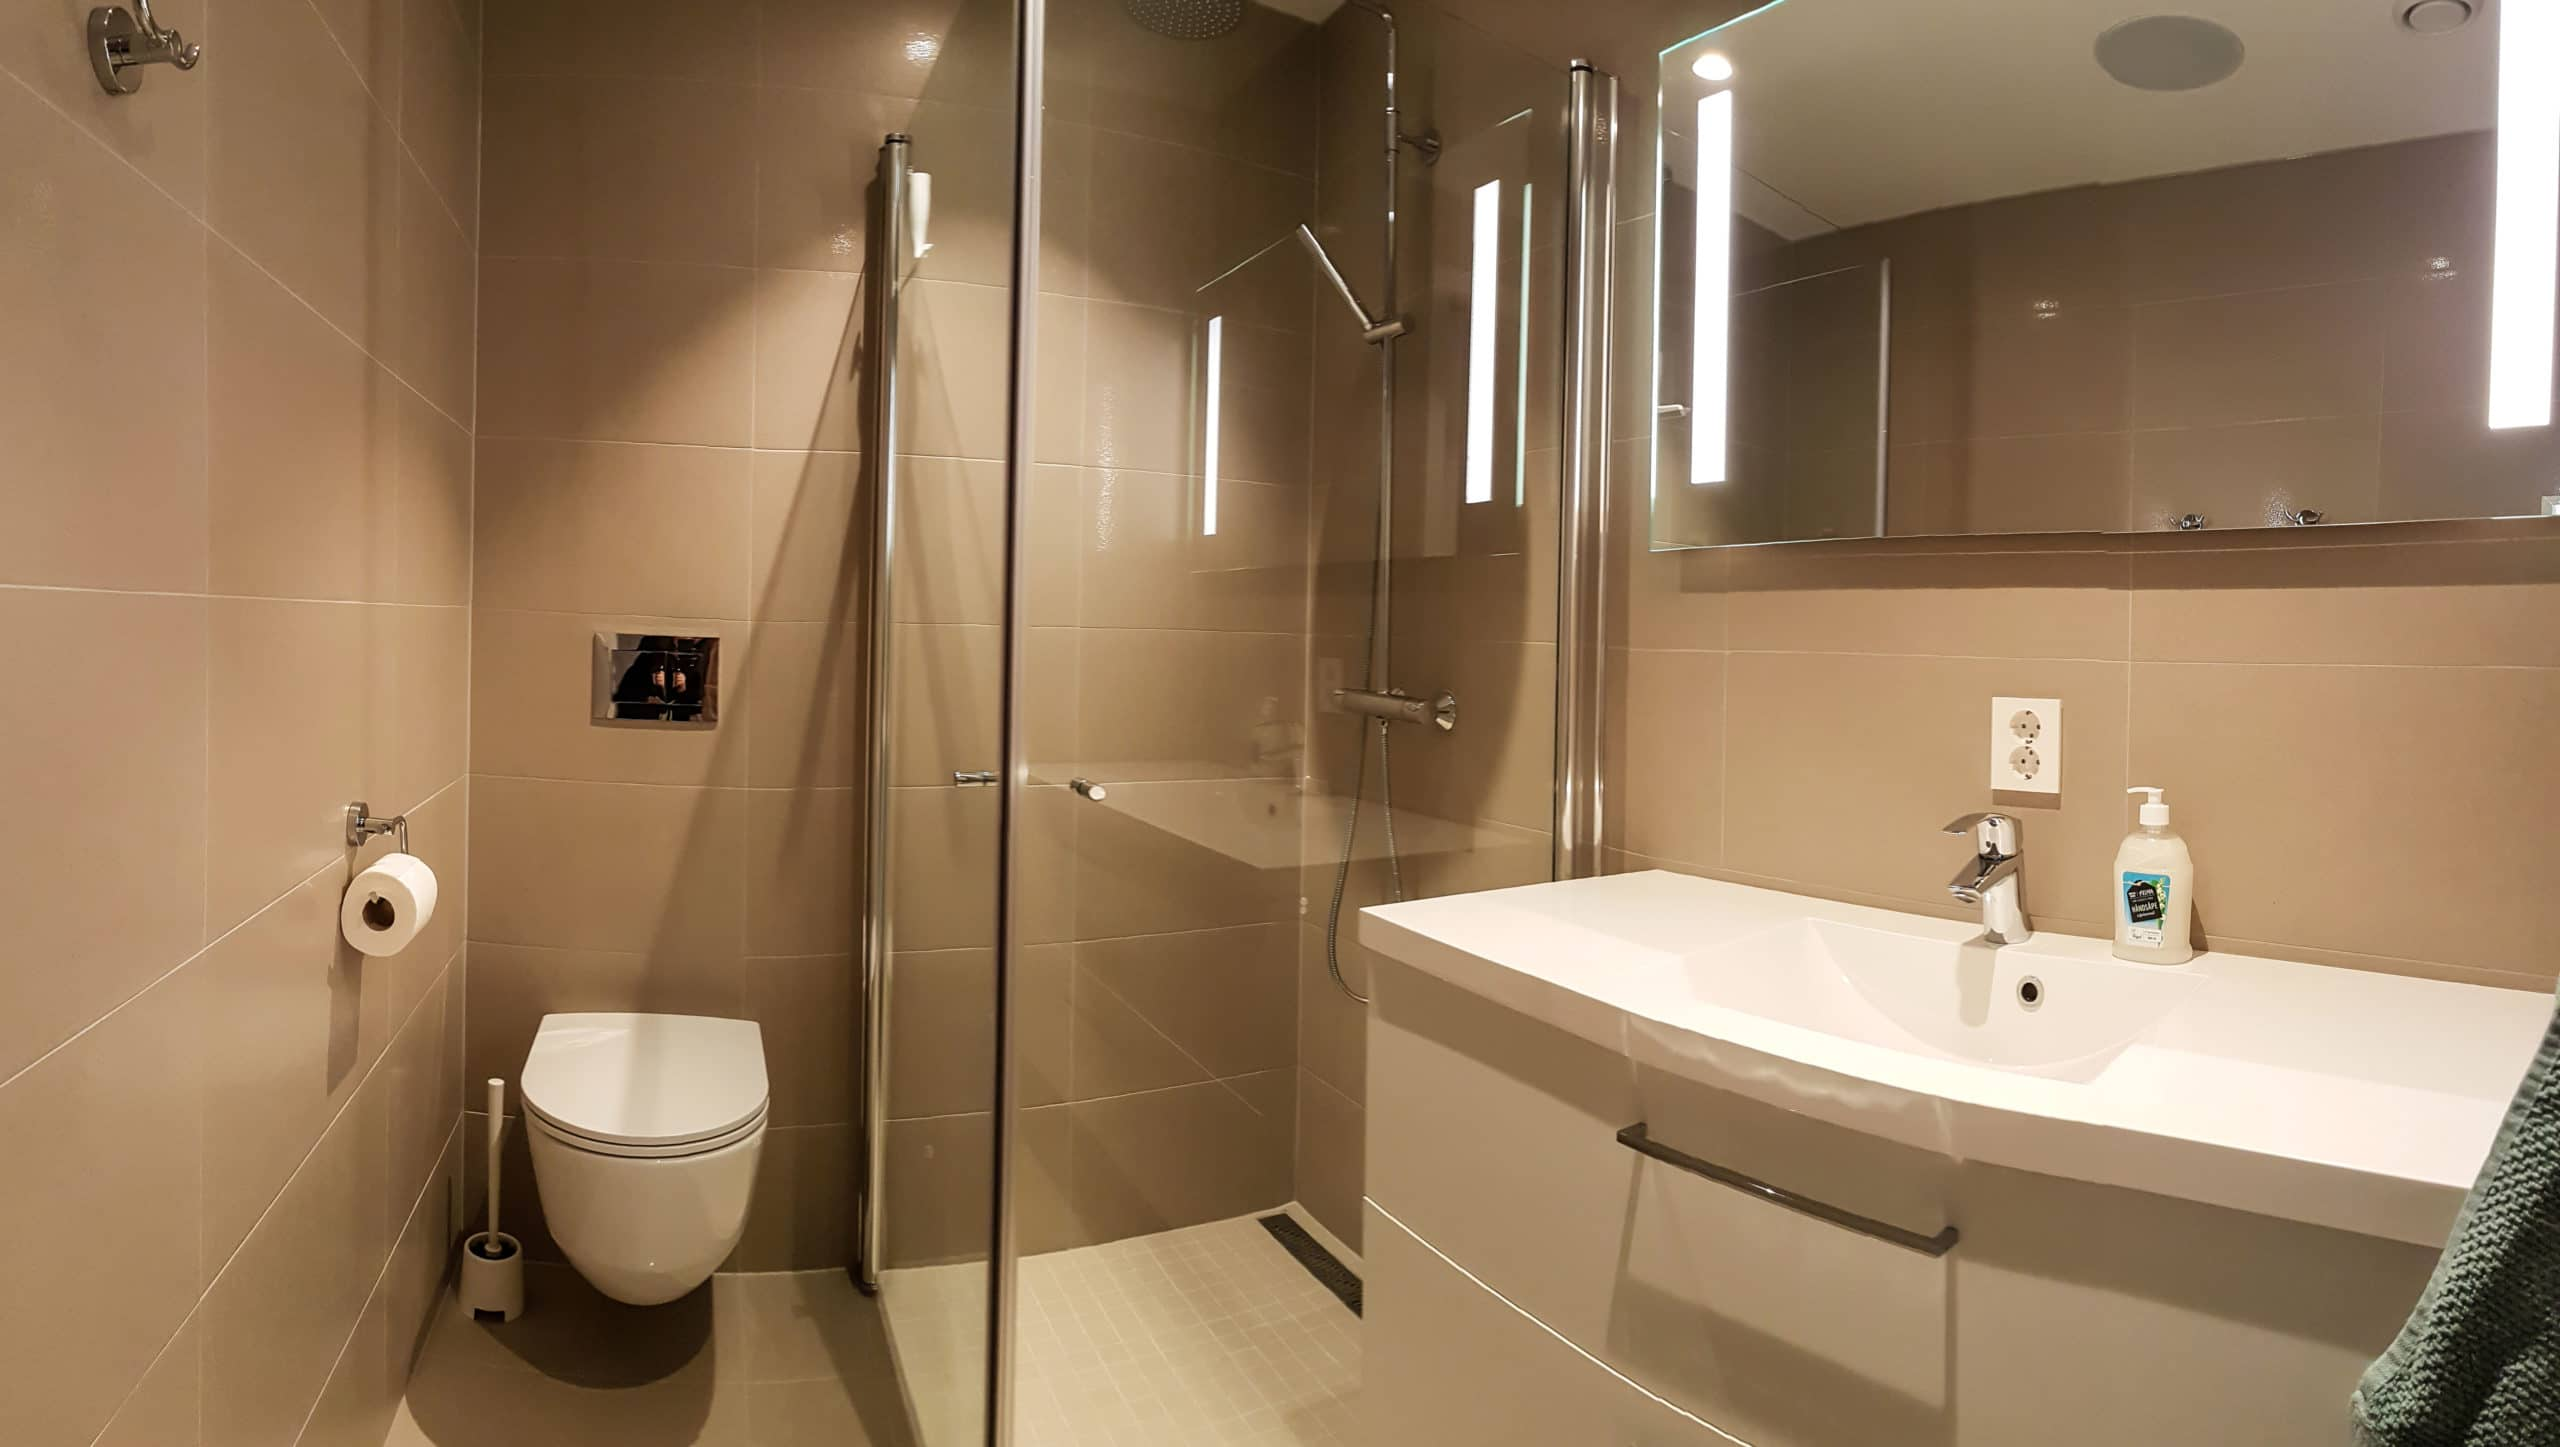 SanSelcabin Bathroom 1st floor